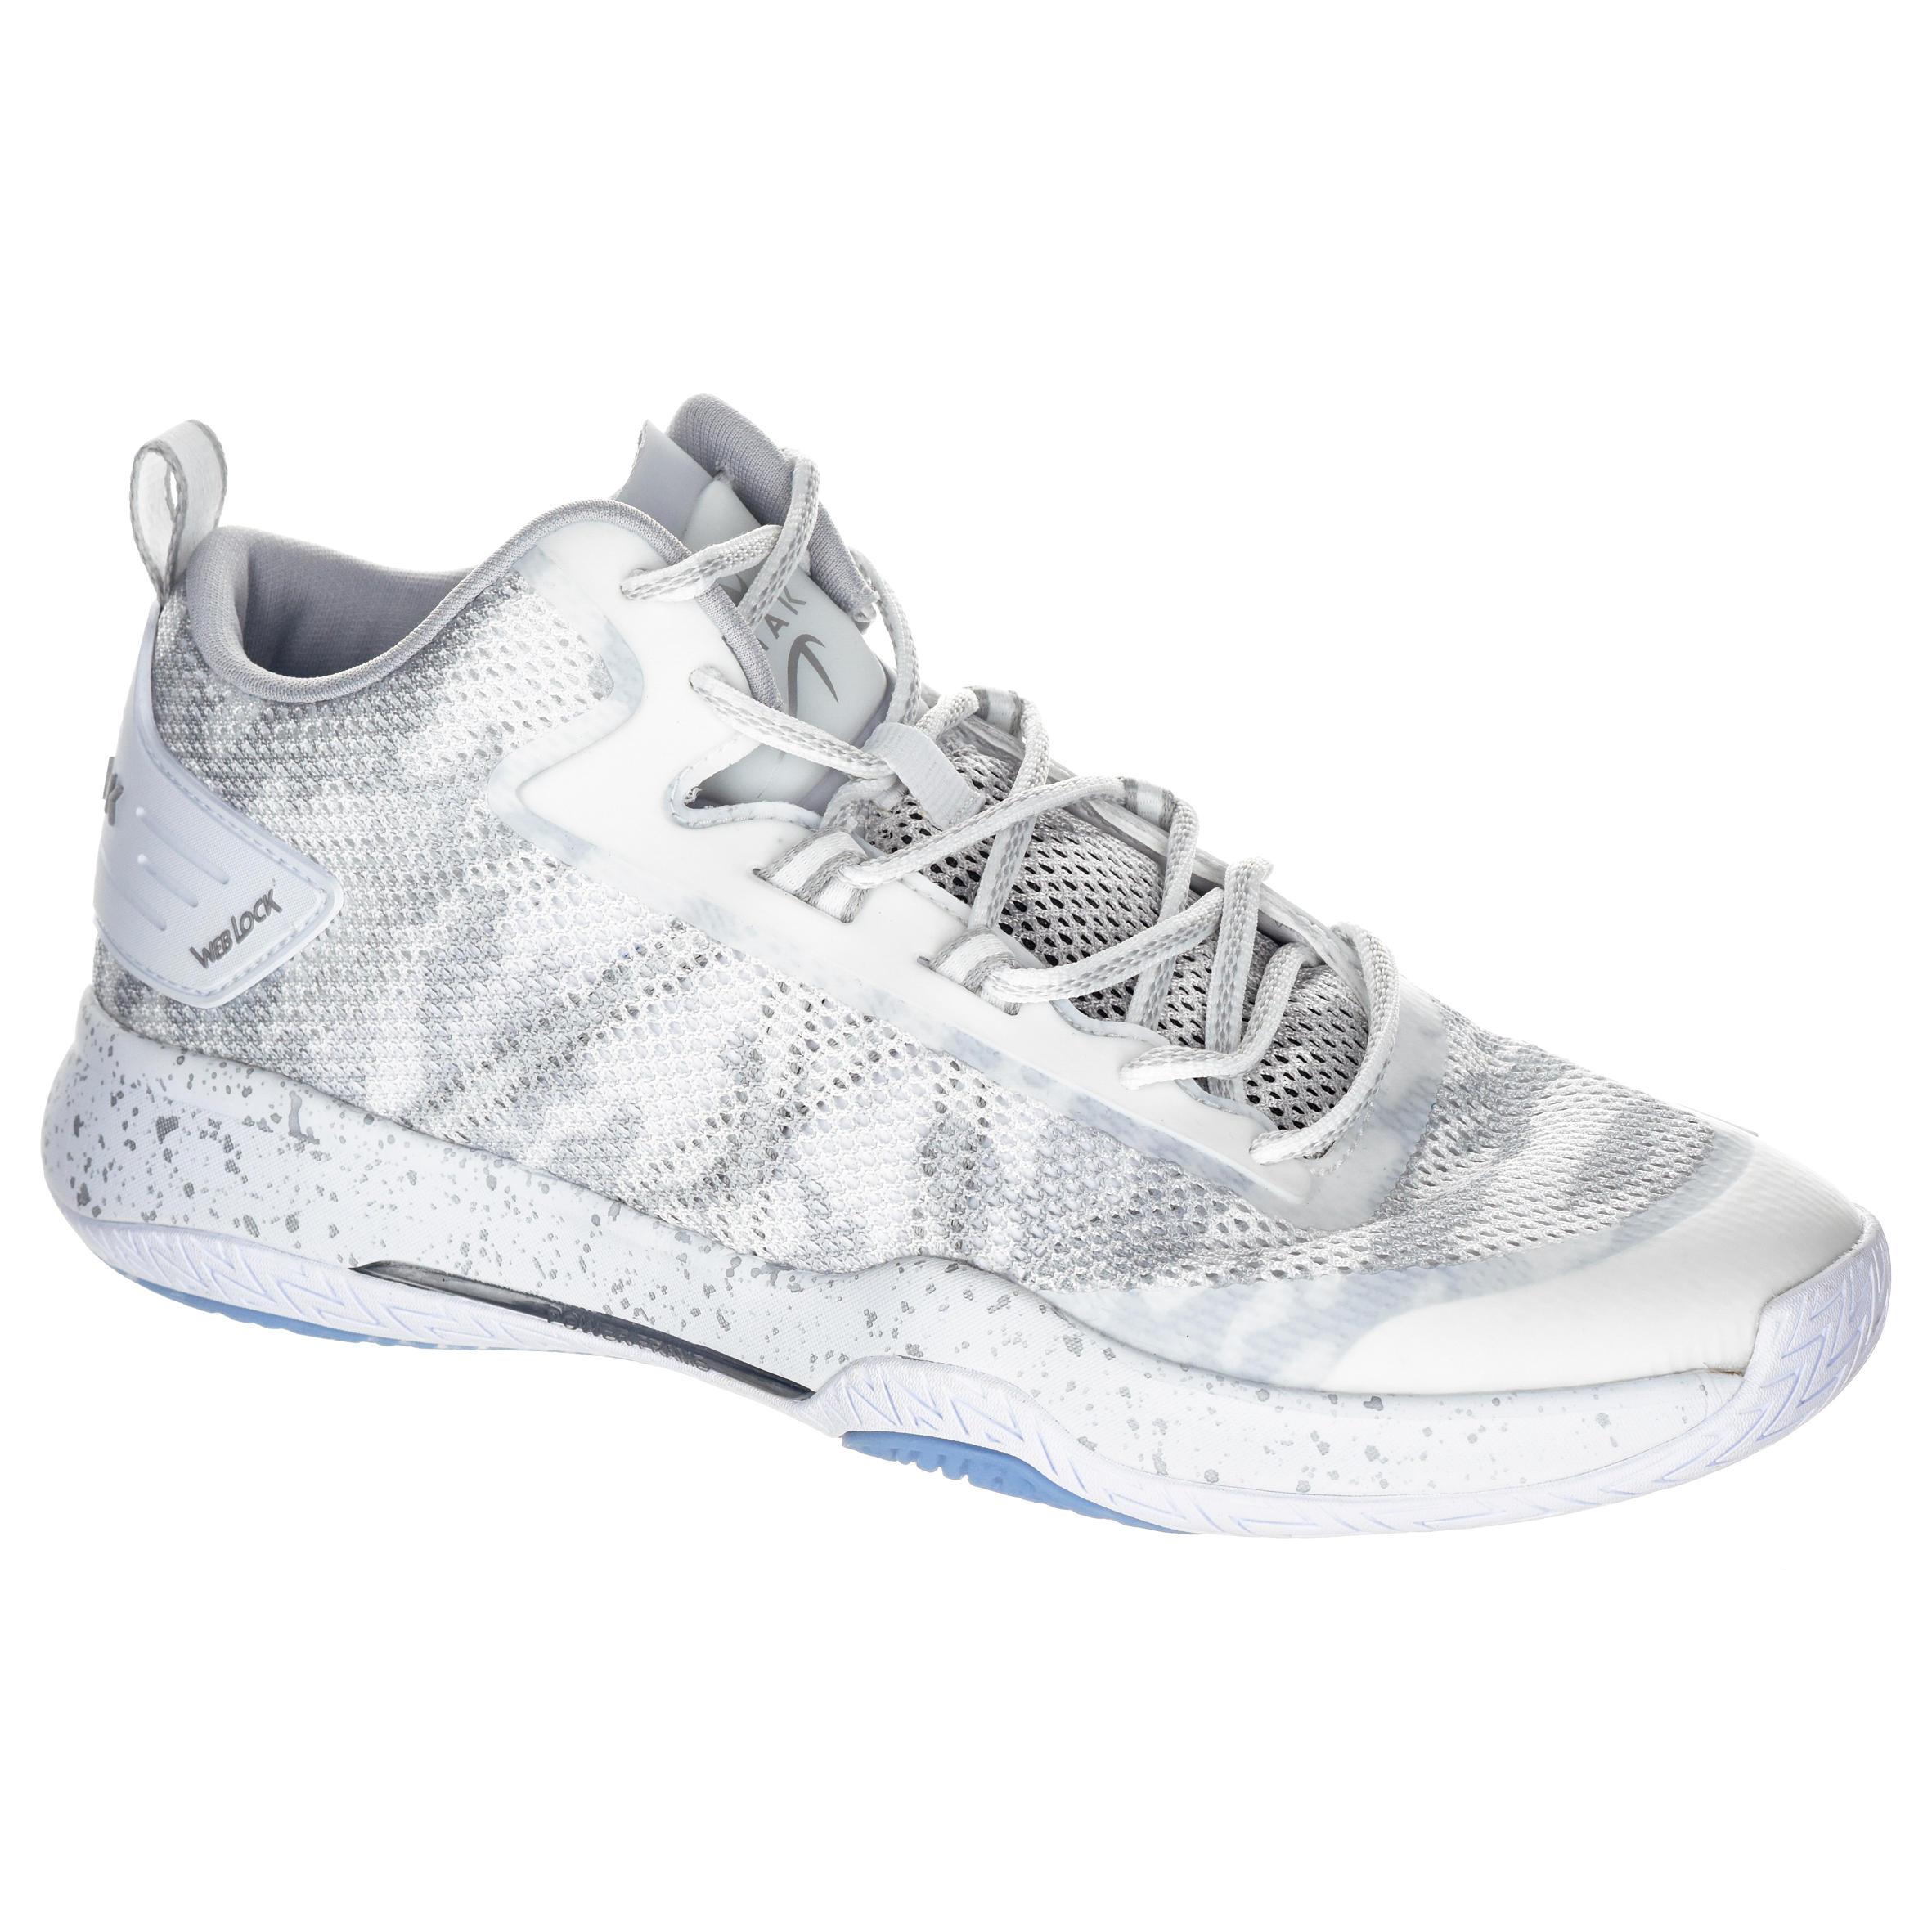 Men's Mid-Rise Basketball Shoes SC500